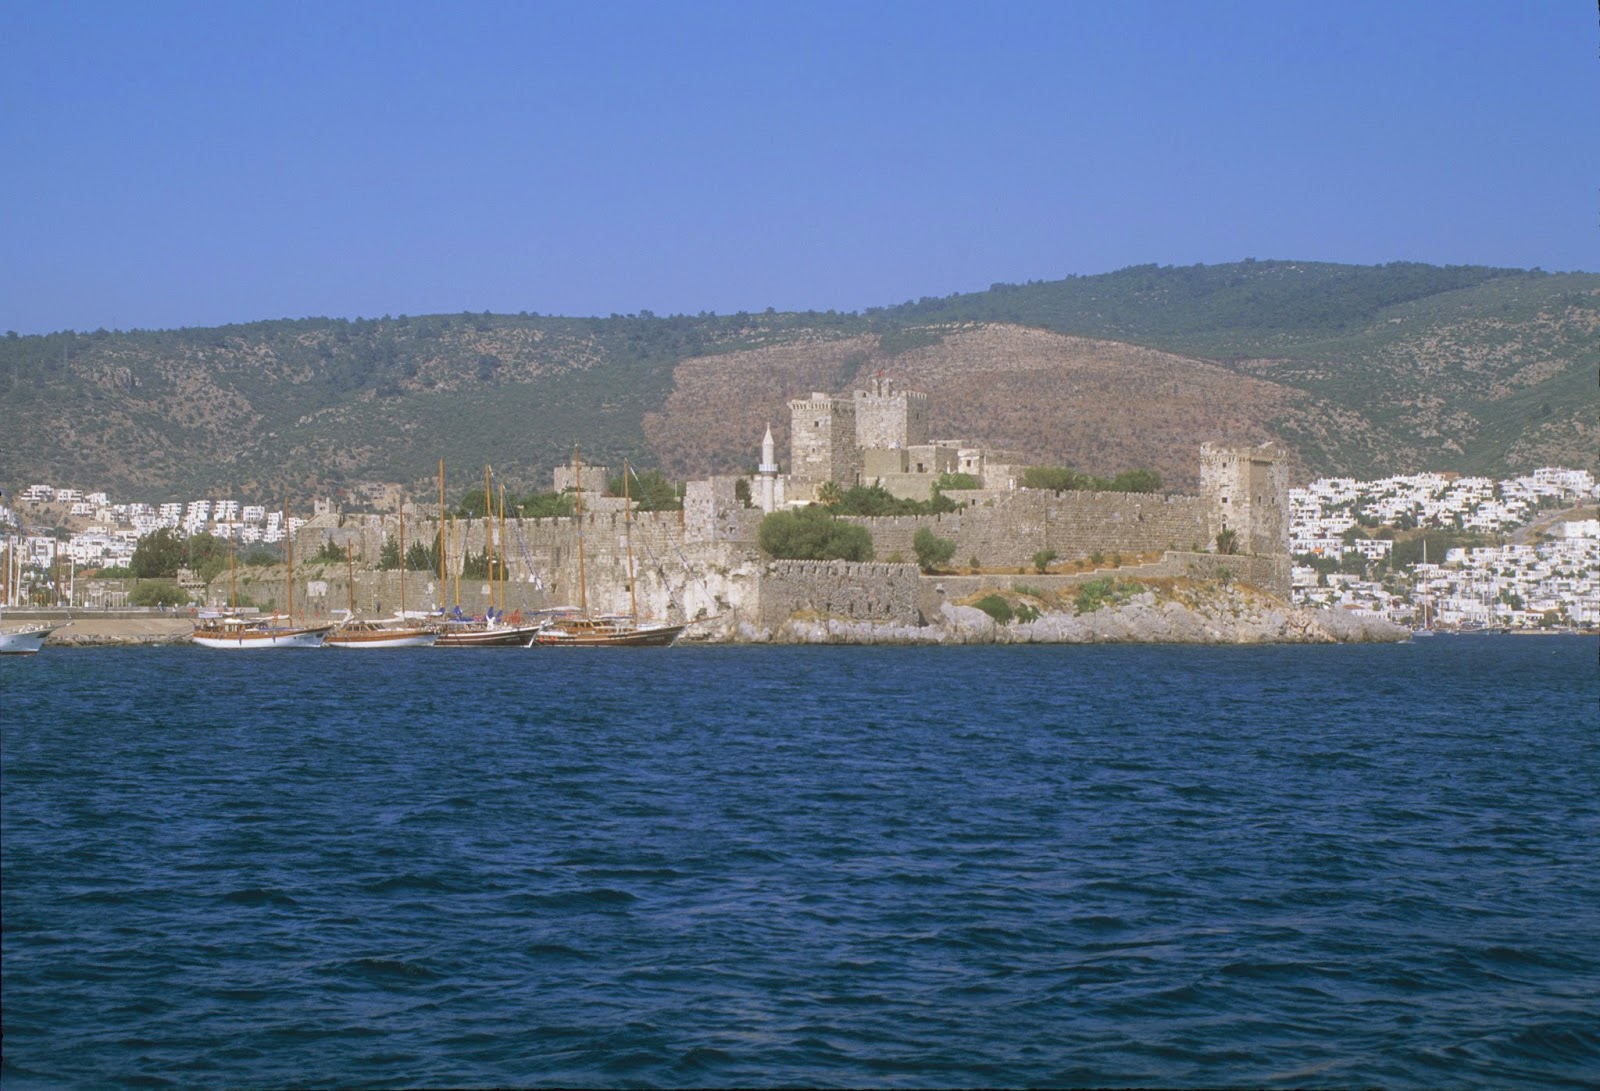 What Materials Were Used To Build The Mausoleum Of Halicarnassus